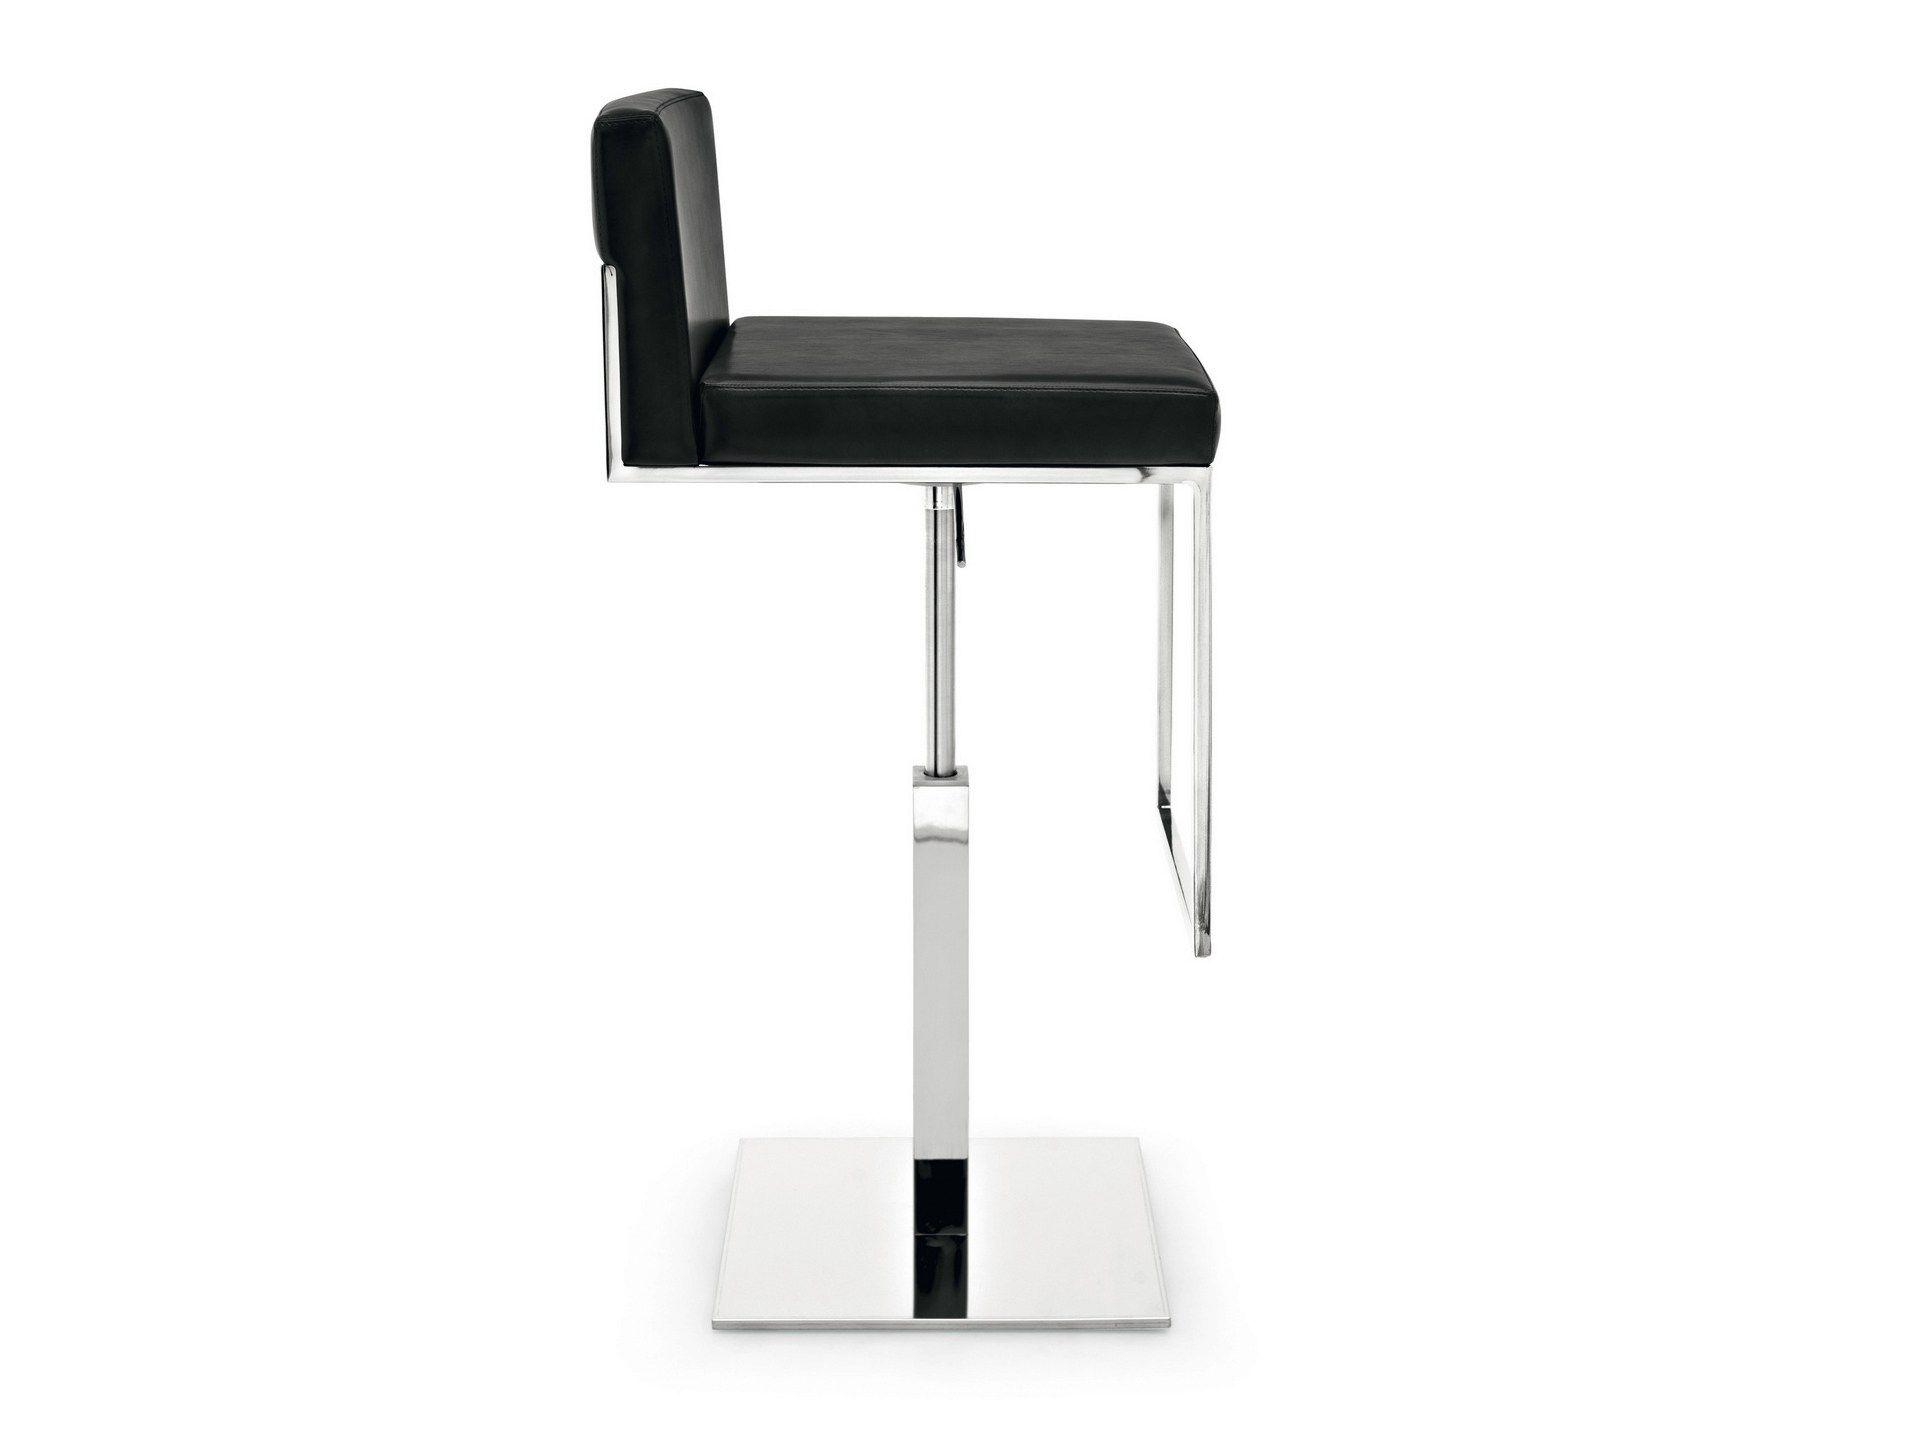 even plus chaise de bar by calligaris design stefano cavazzana s t c. Black Bedroom Furniture Sets. Home Design Ideas